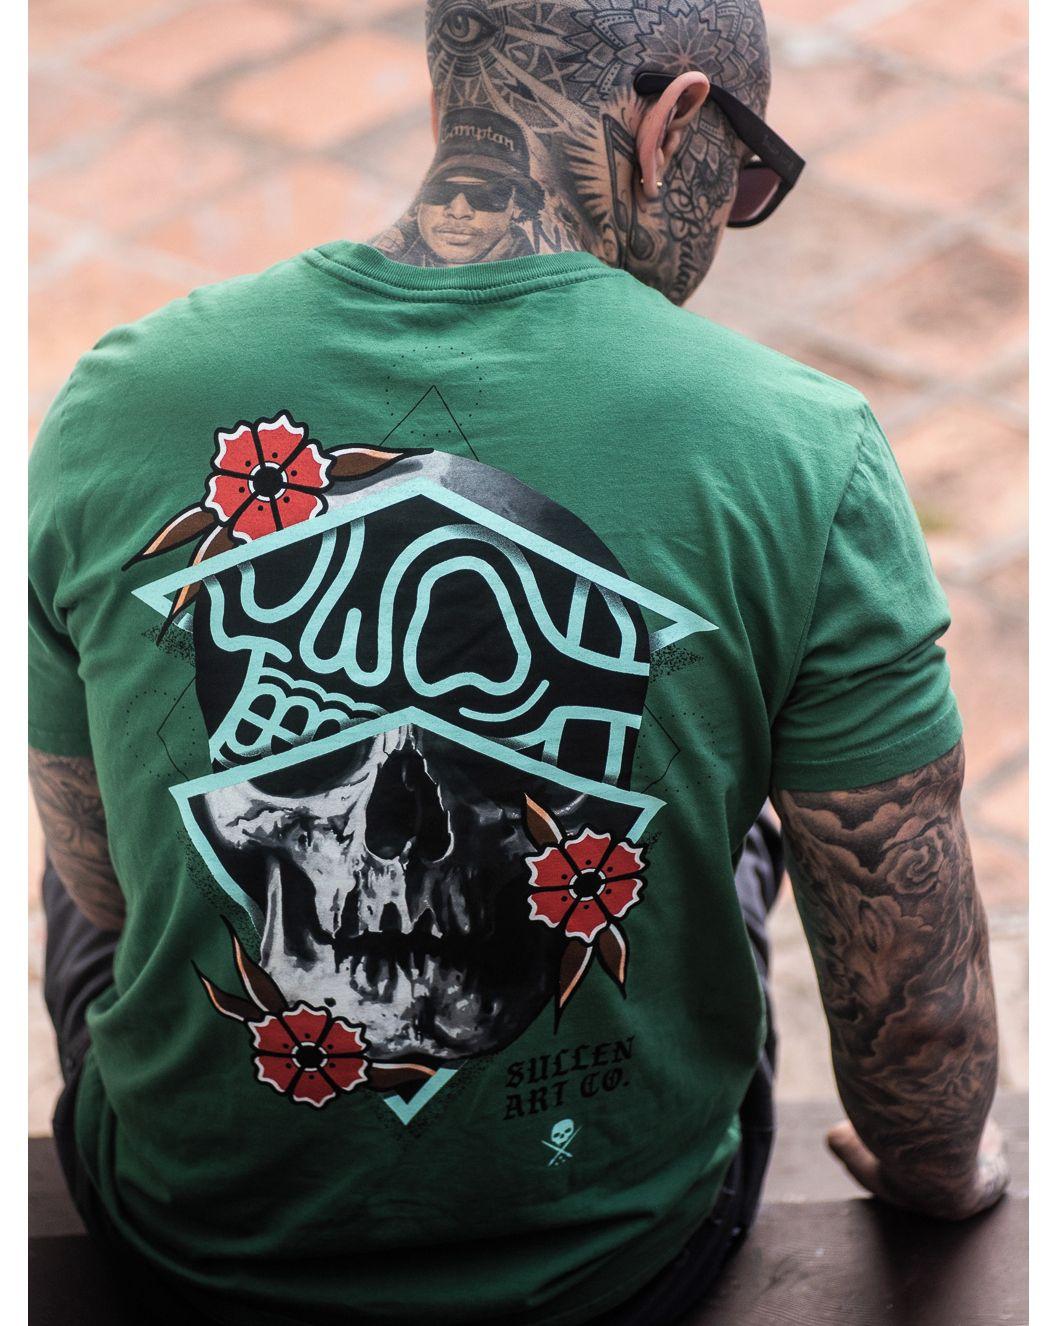 🙏⚡️👏 @chrisrigonitattooer Skull TShirt Brand: @sullenclothing ——————————————————————— ⚜️FOLLOW⚜️ @skingiants for daily fashion inspiration! Sharing only the best fashion brands on instagram —————————————————————— #sullenclothing #baseballshirt #tshirt #white #fashion #apparel #stylegiants #tattoolove #tattooed #tattoodesign #tattoolover #tattooworld #fashionofinstagram #tattoolovers #inked #tat #tats #aff